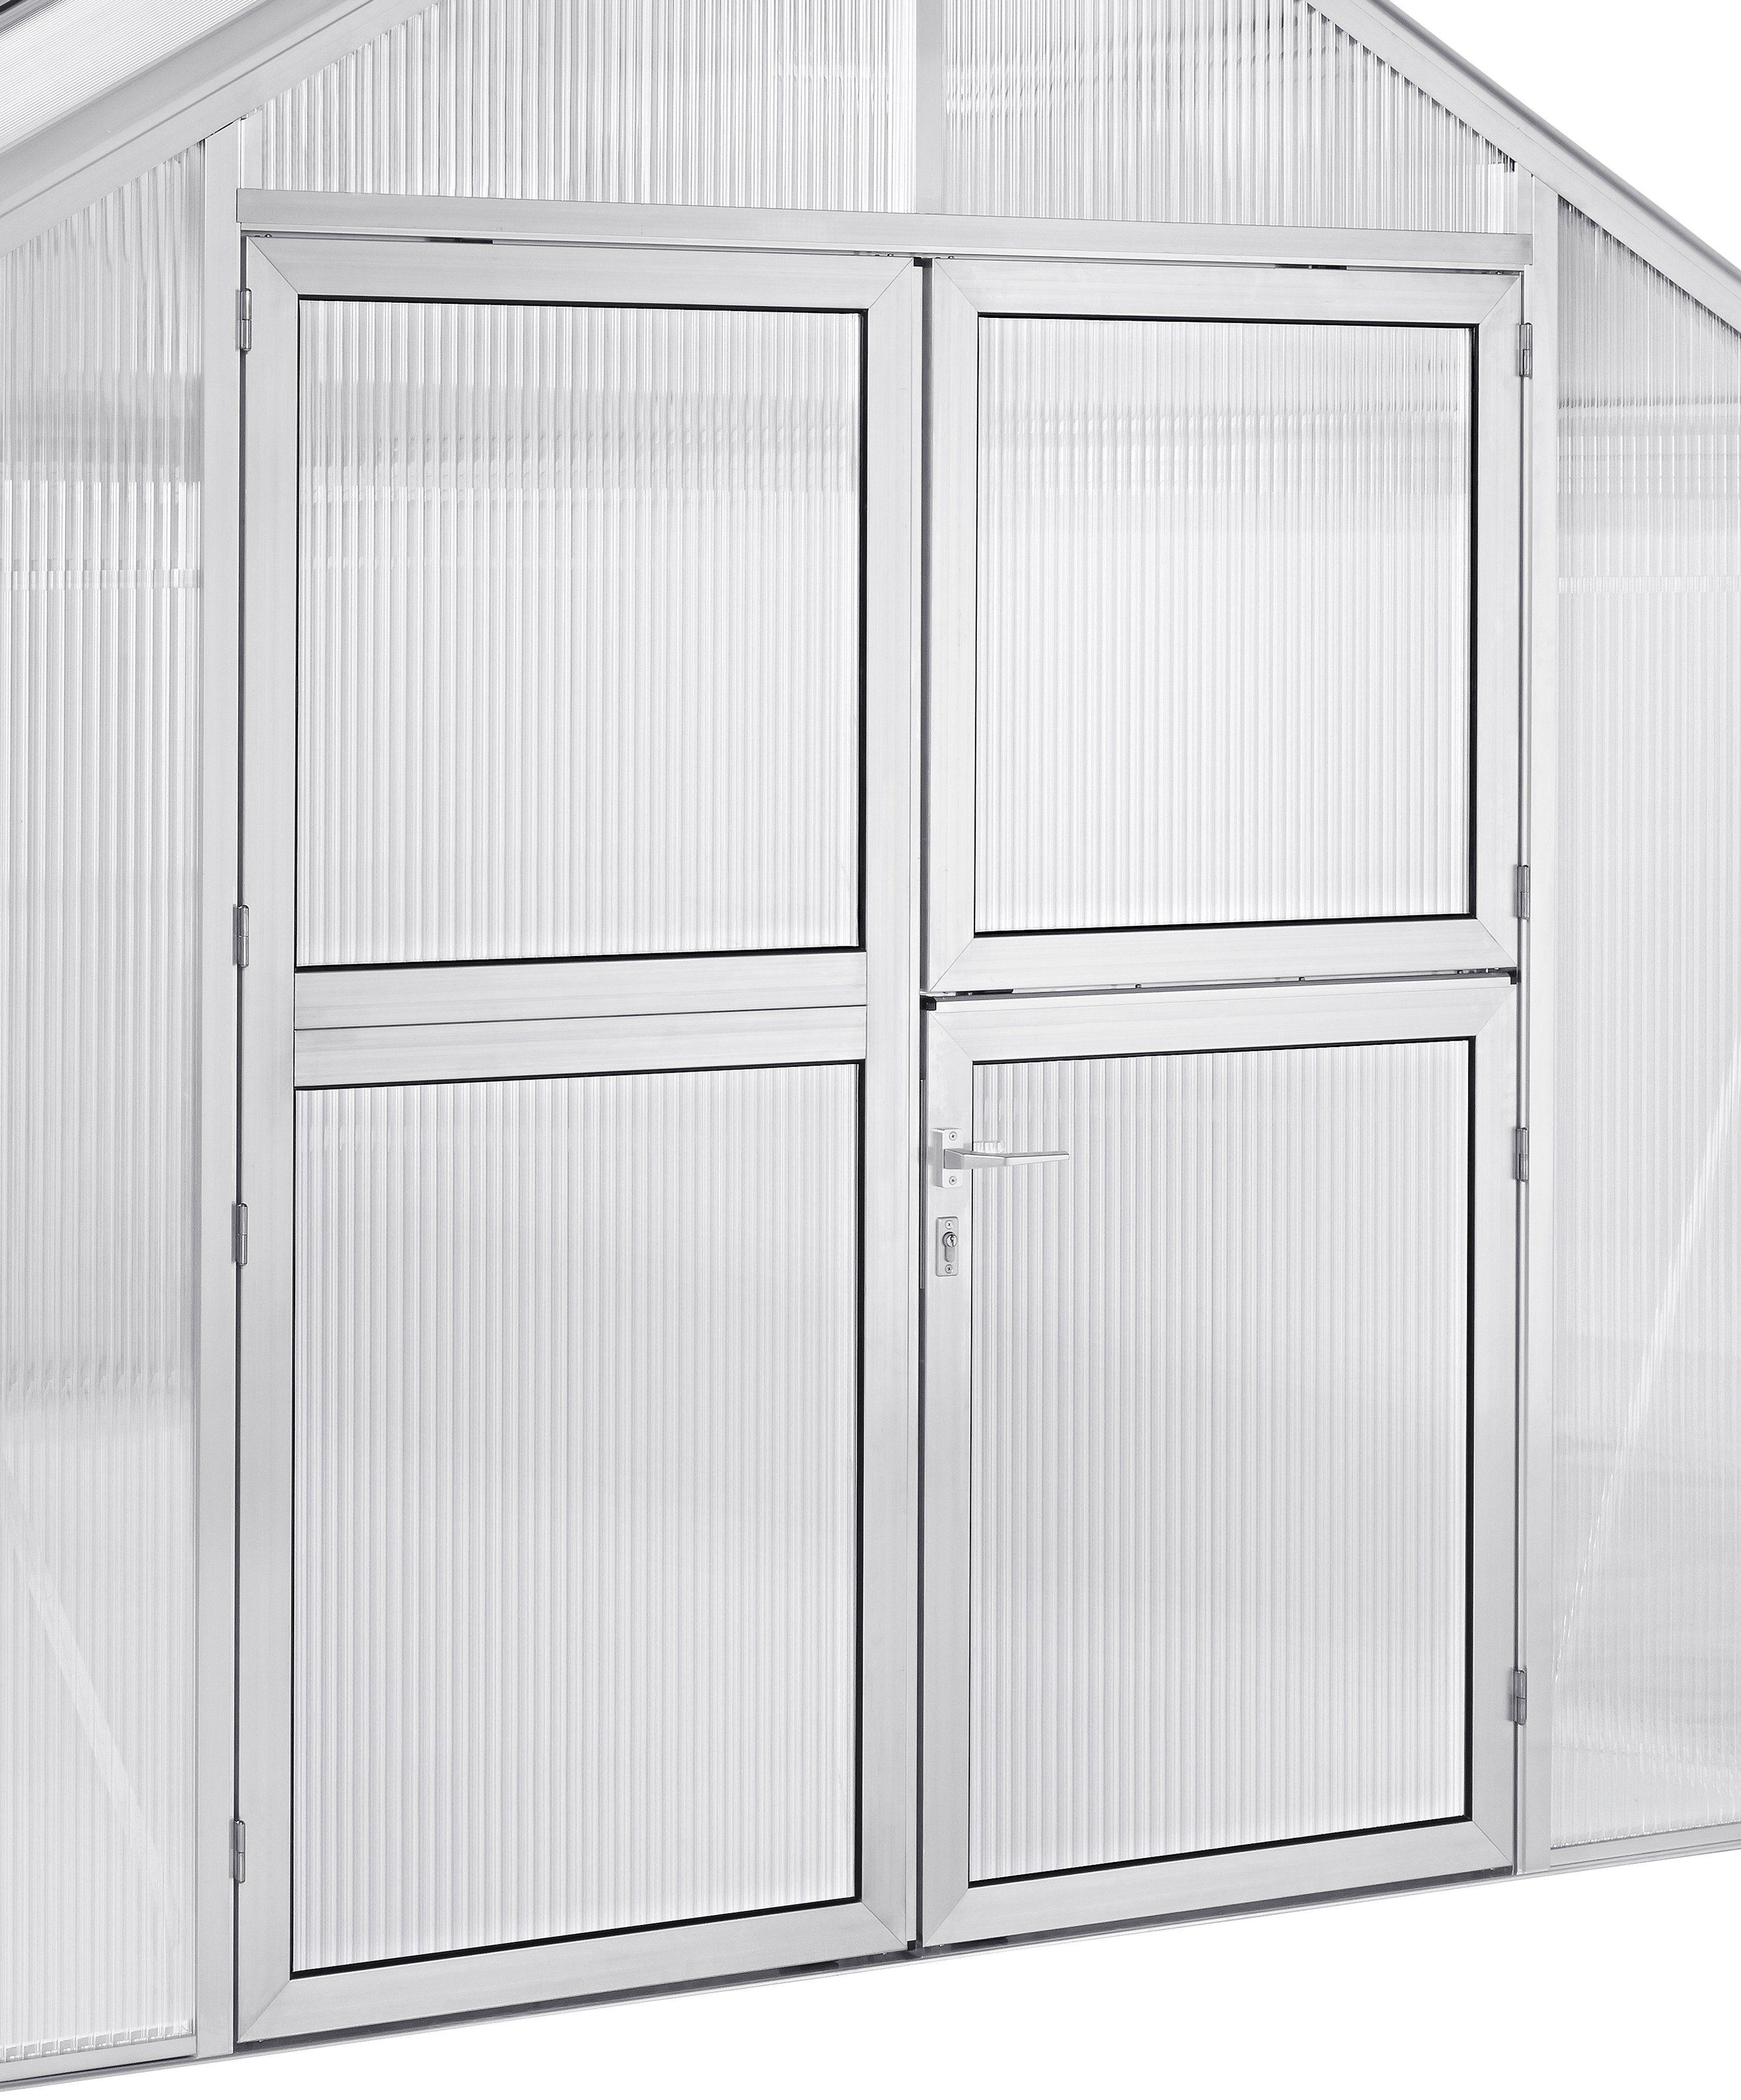 BECKMANN Doppeltür Aluminium, silber, BxH: 165 x 190 cm